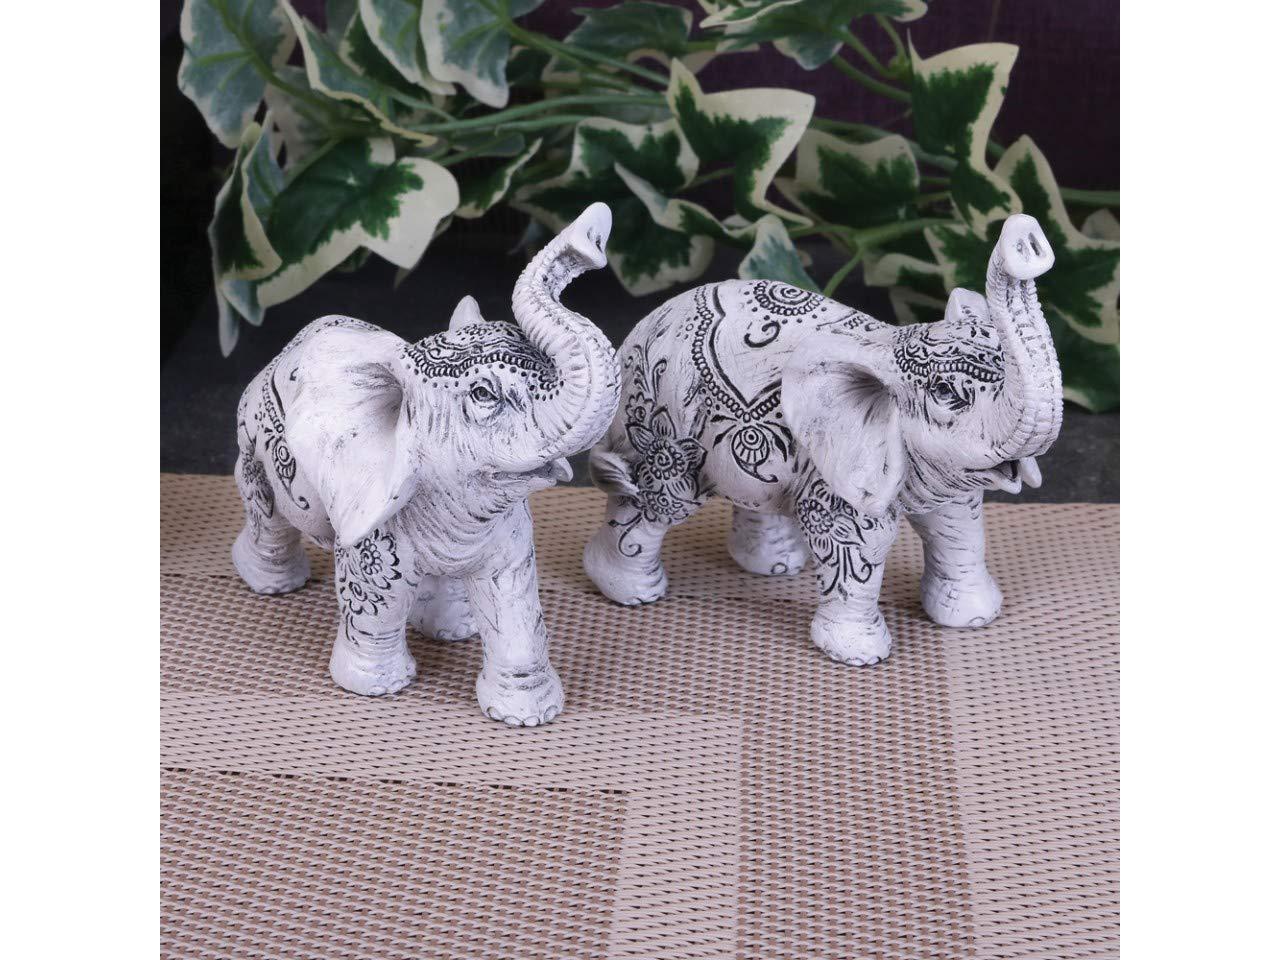 Figura Decorativa de Elefante Nemesis Now Henna Harmony Juego de 2, 9,5 cm